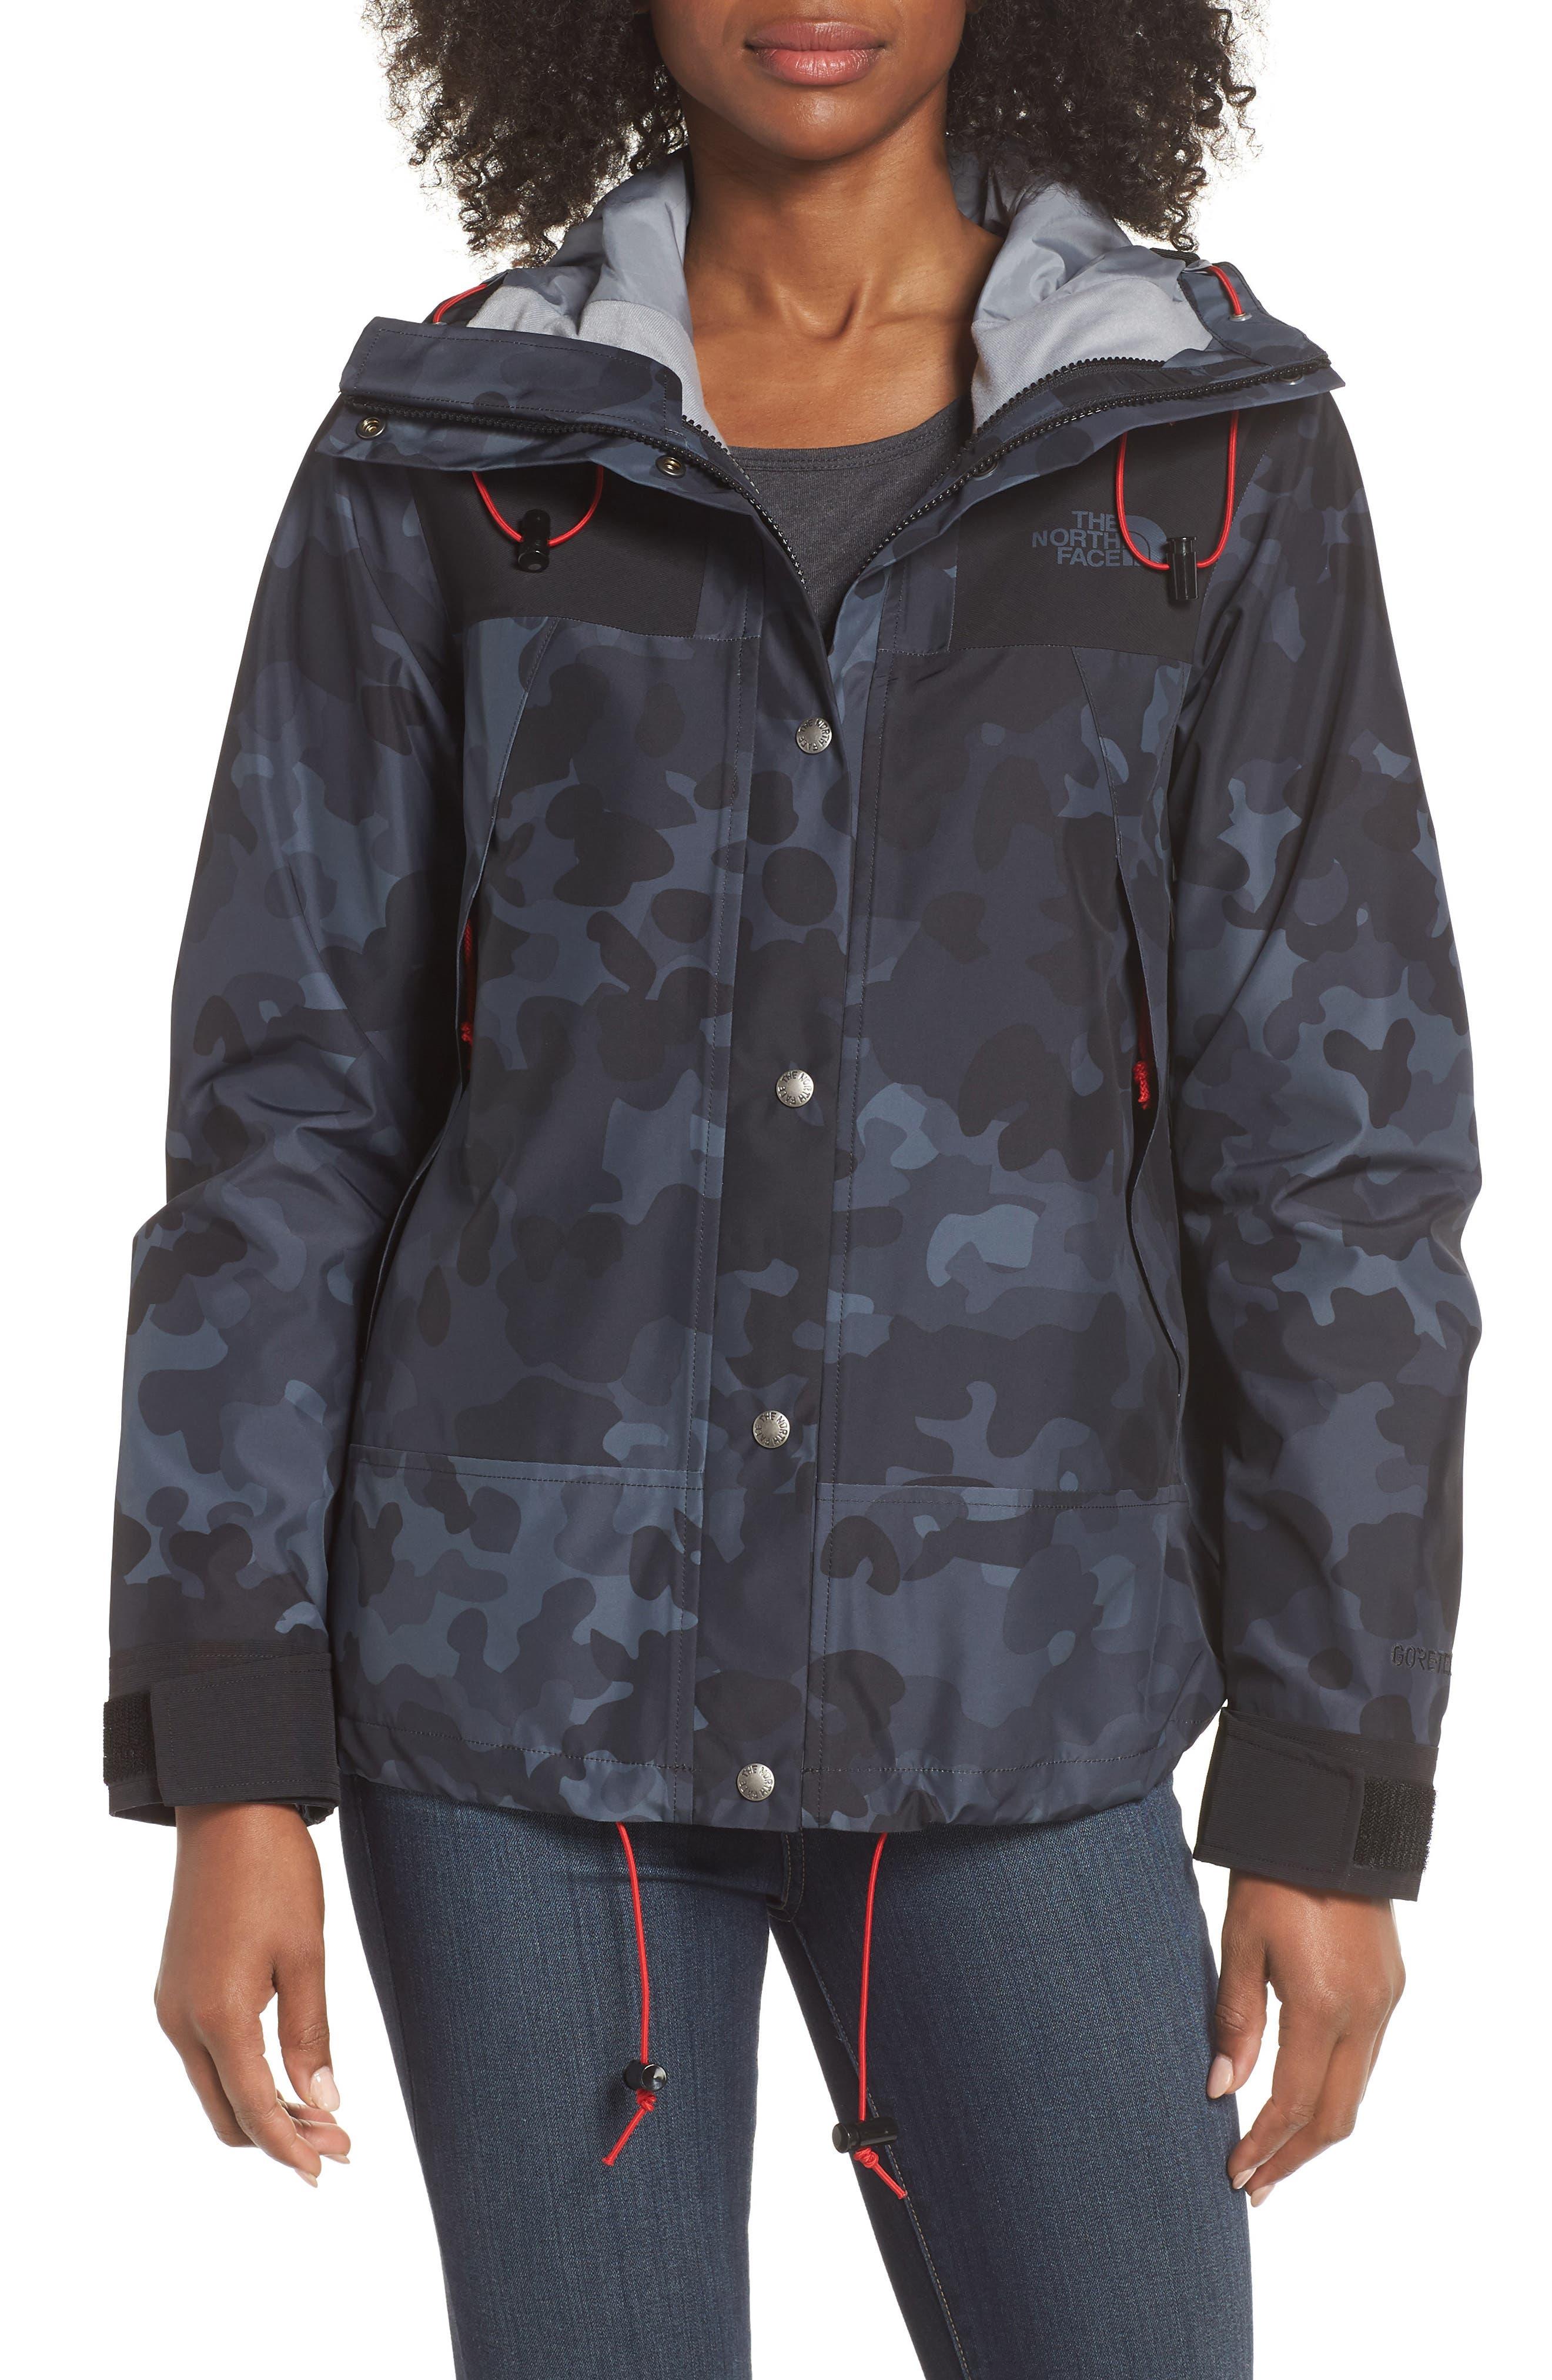 1990 Mountain Gore-Tex<sup>®</sup> Waterproof Jacket,                         Main,                         color, TNF BLACK MACROFLECK PRINT